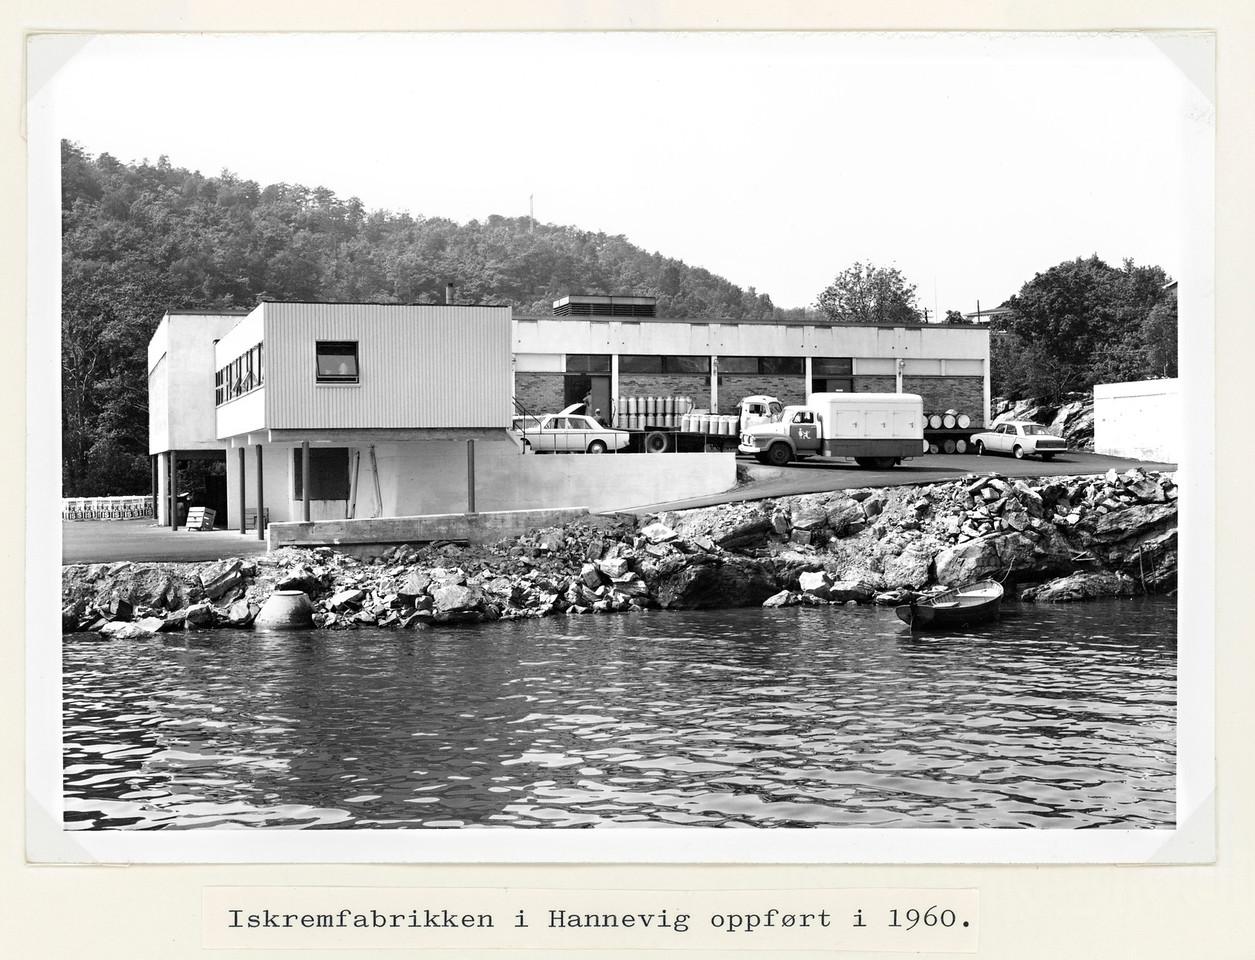 Fabrikken i Hannevika